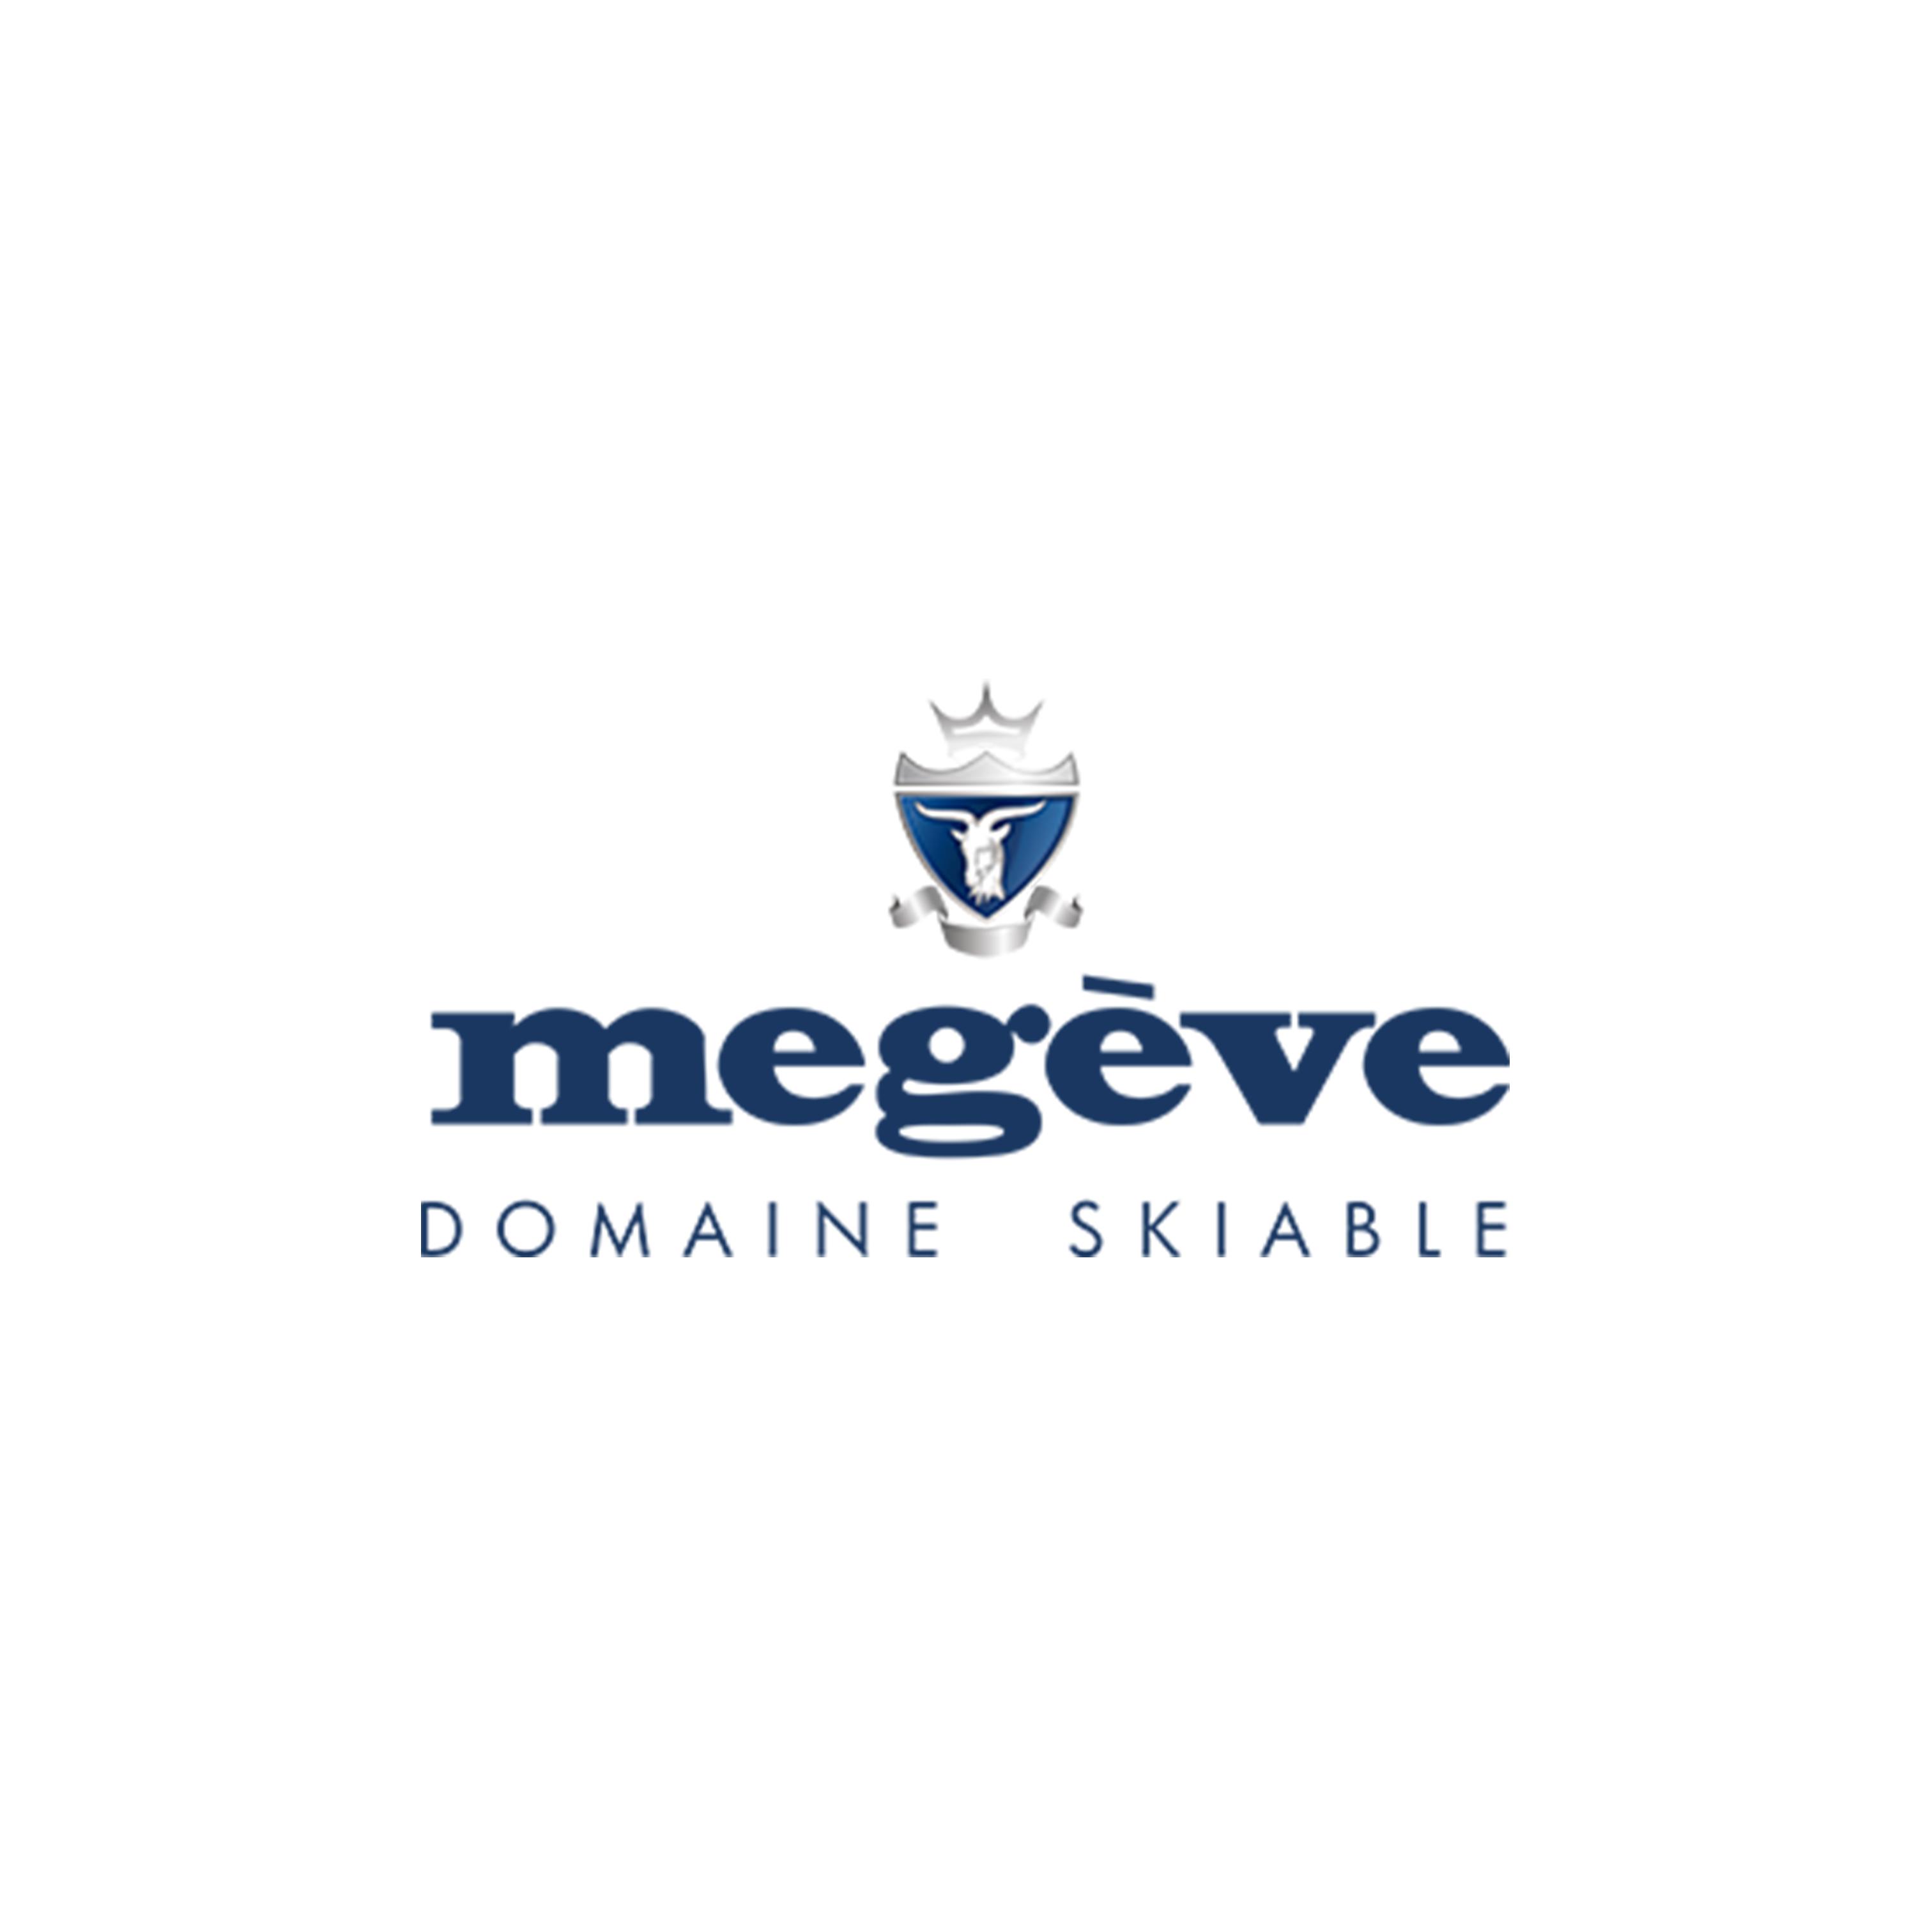 megeve-domaine-skiable-logo